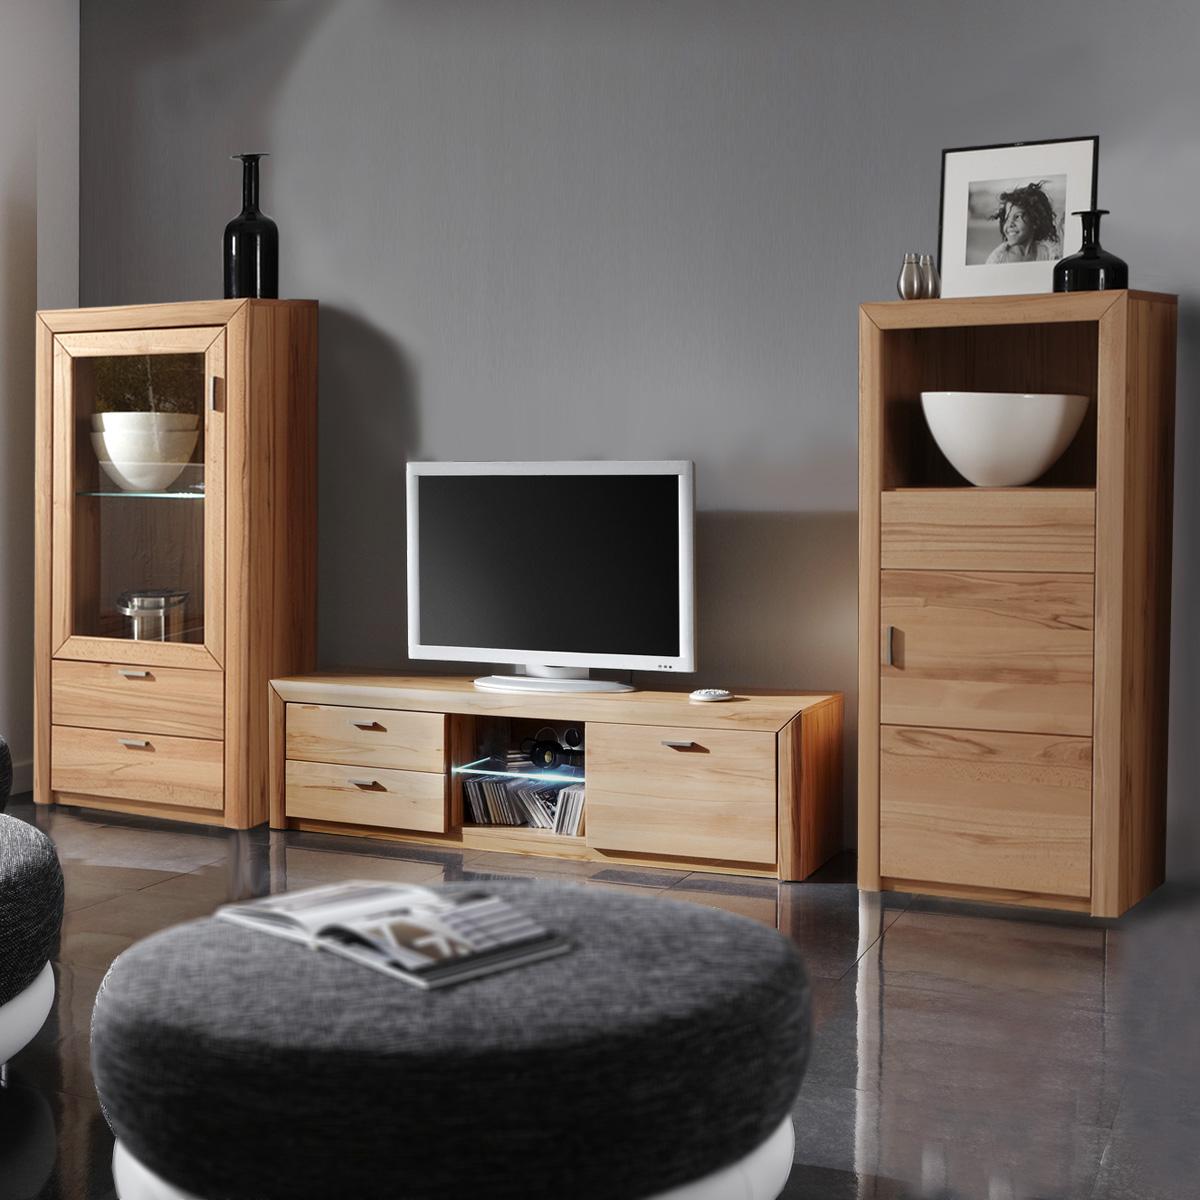 wohnwand passepartout kernbuche anbauwand 3 tlg. Black Bedroom Furniture Sets. Home Design Ideas